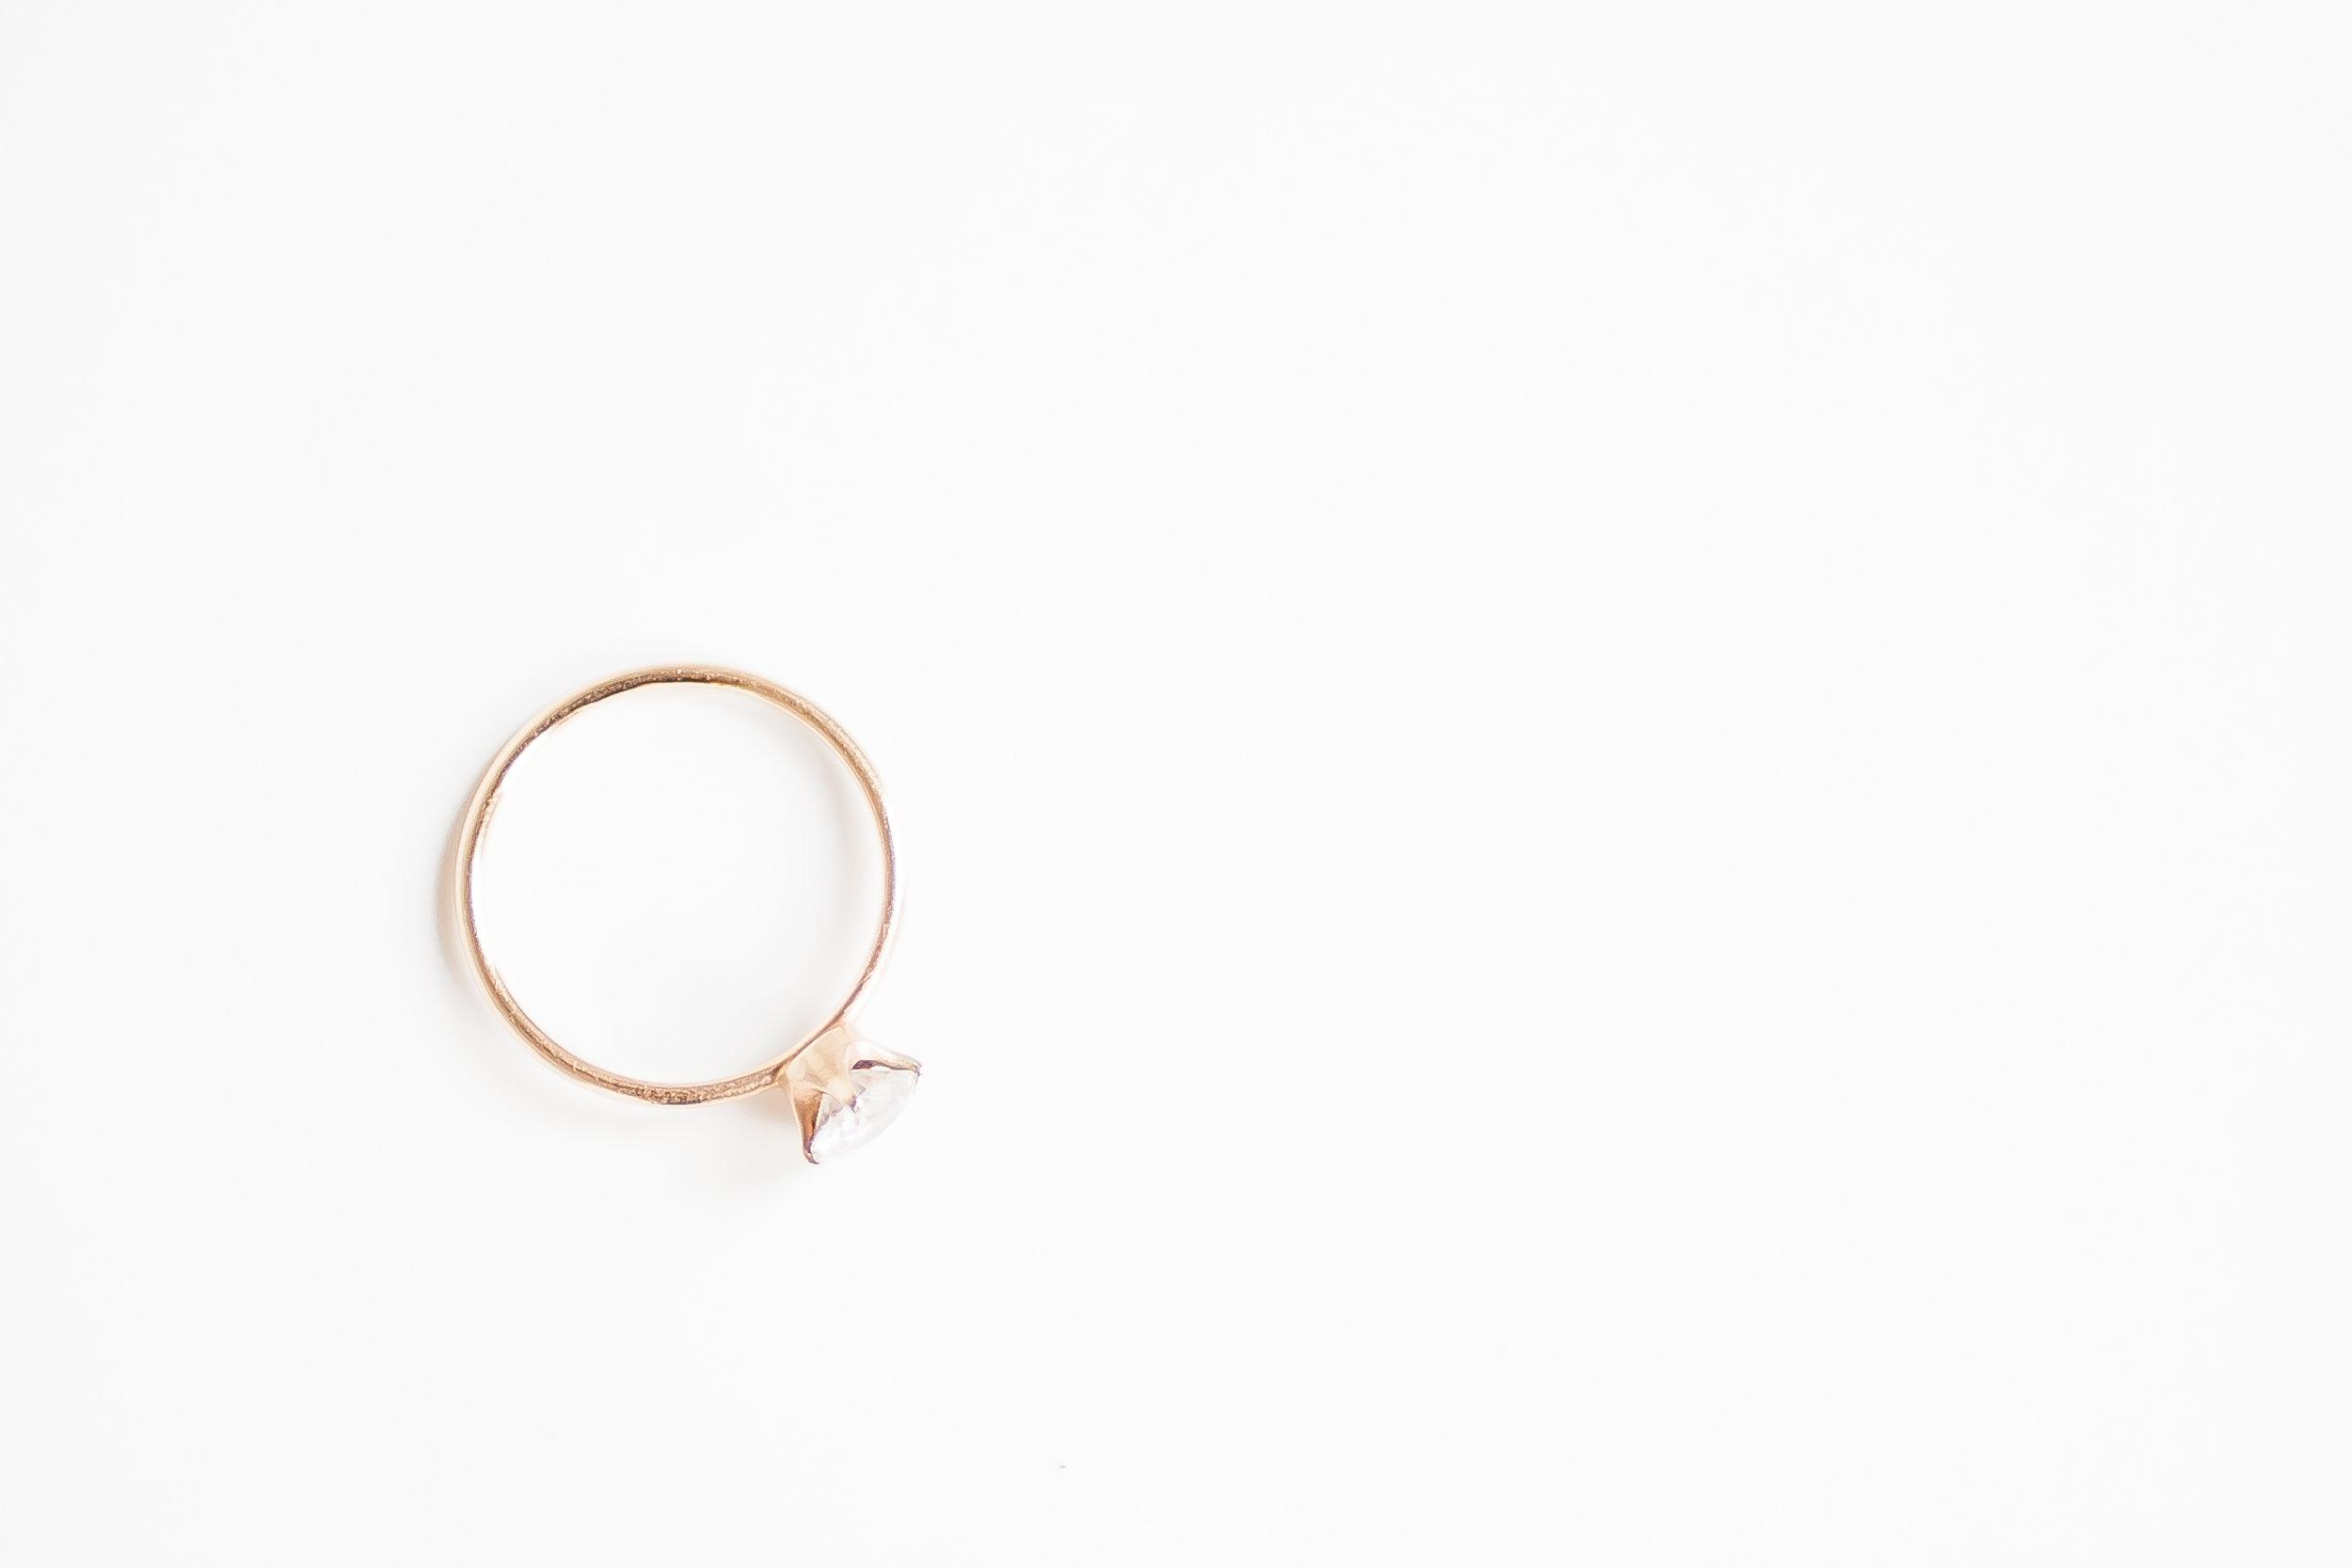 ring-7091.jpg